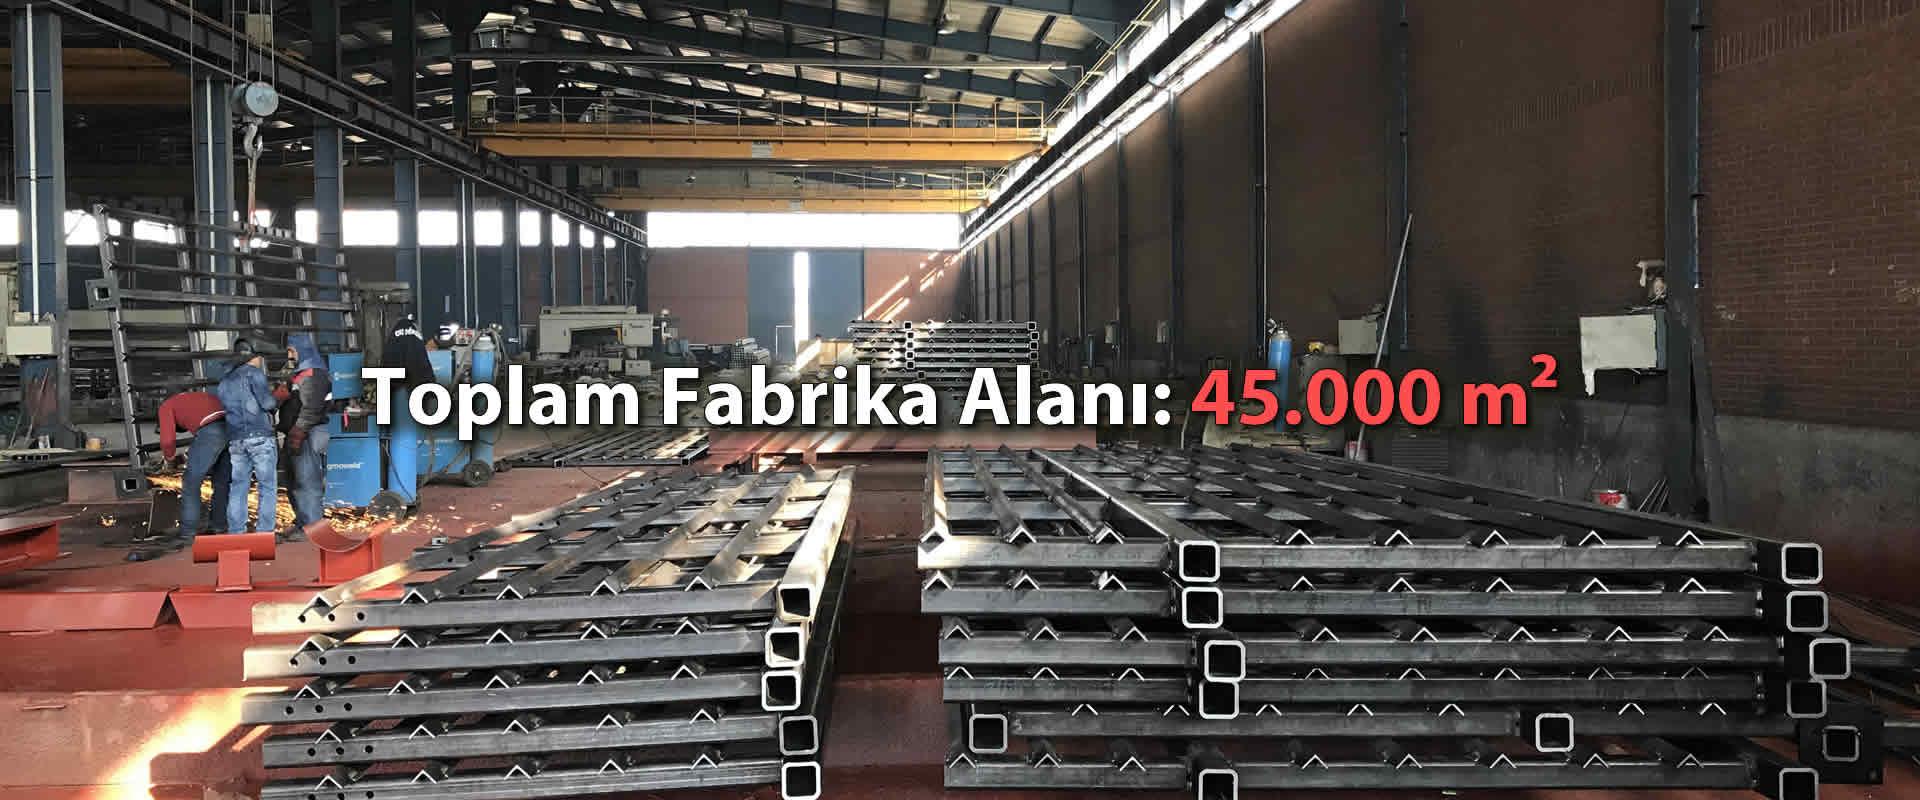 Toplam-Fabrika-Alanı.v2